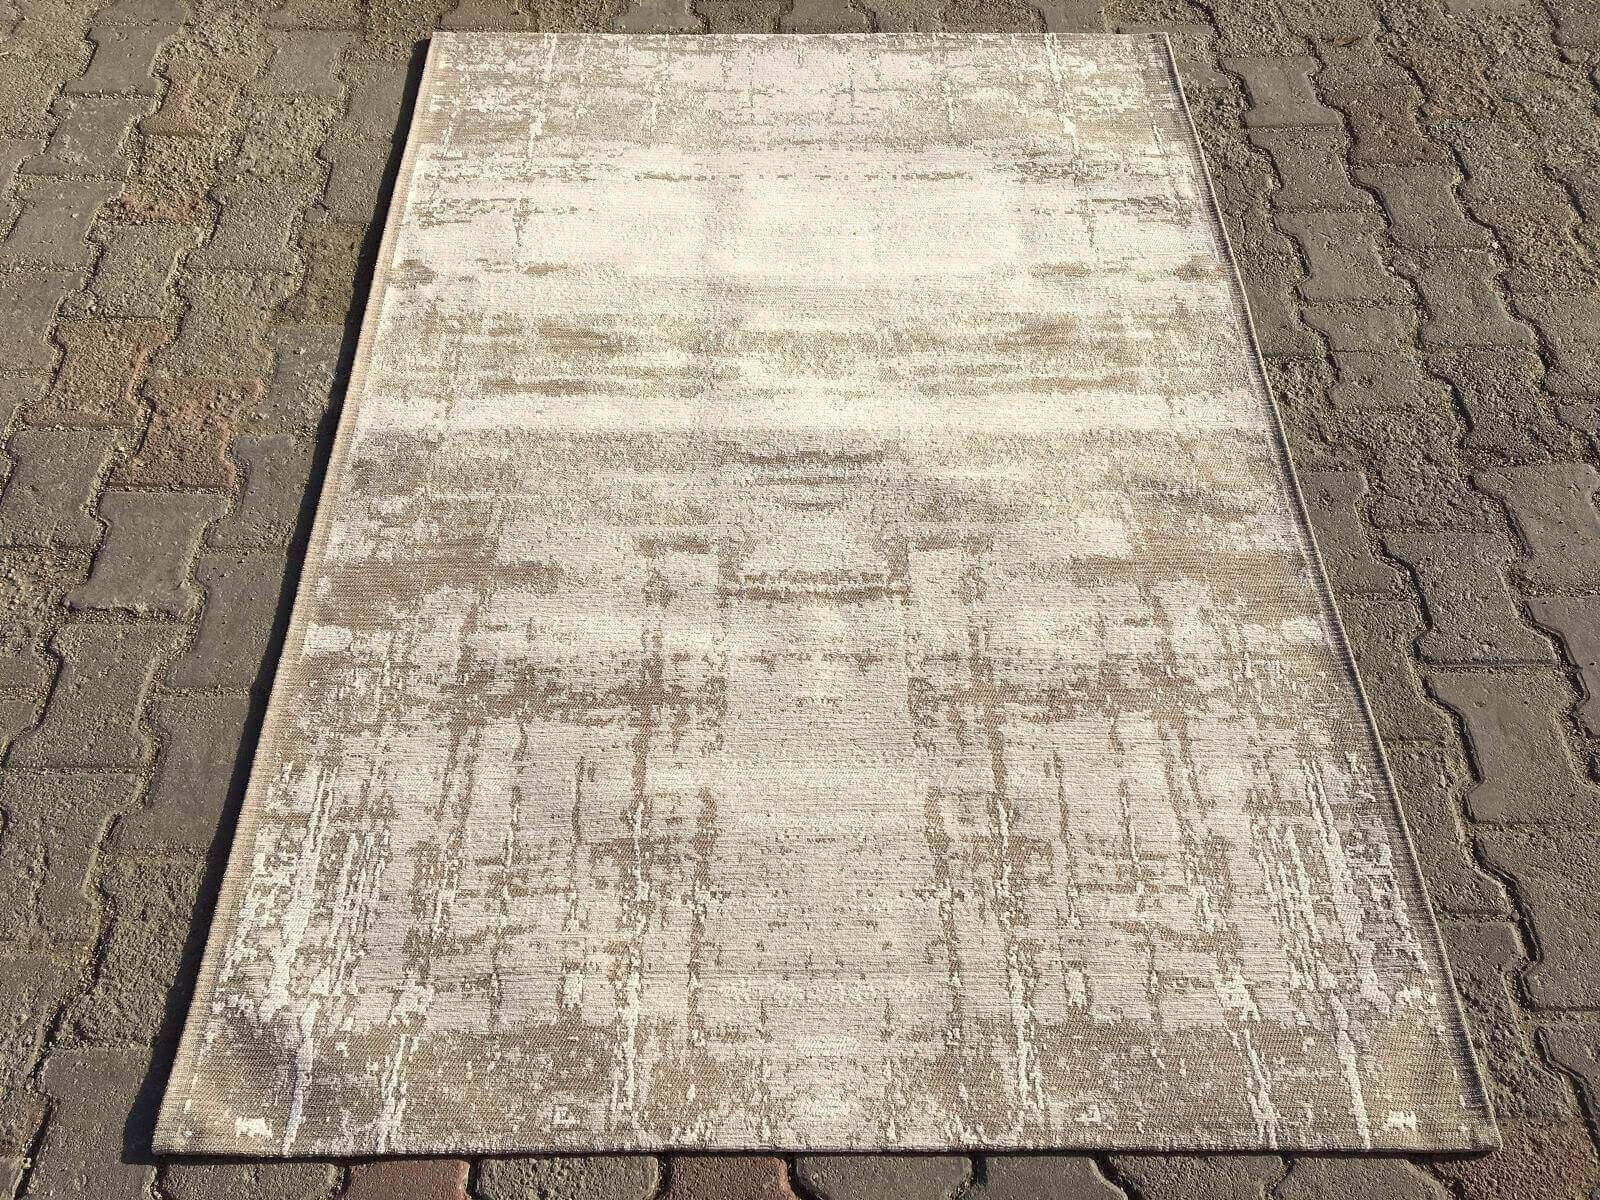 COTTON LÜX KİLİM BEJ 120X180 Cotton Lux Kilim Dekoratif Kilim